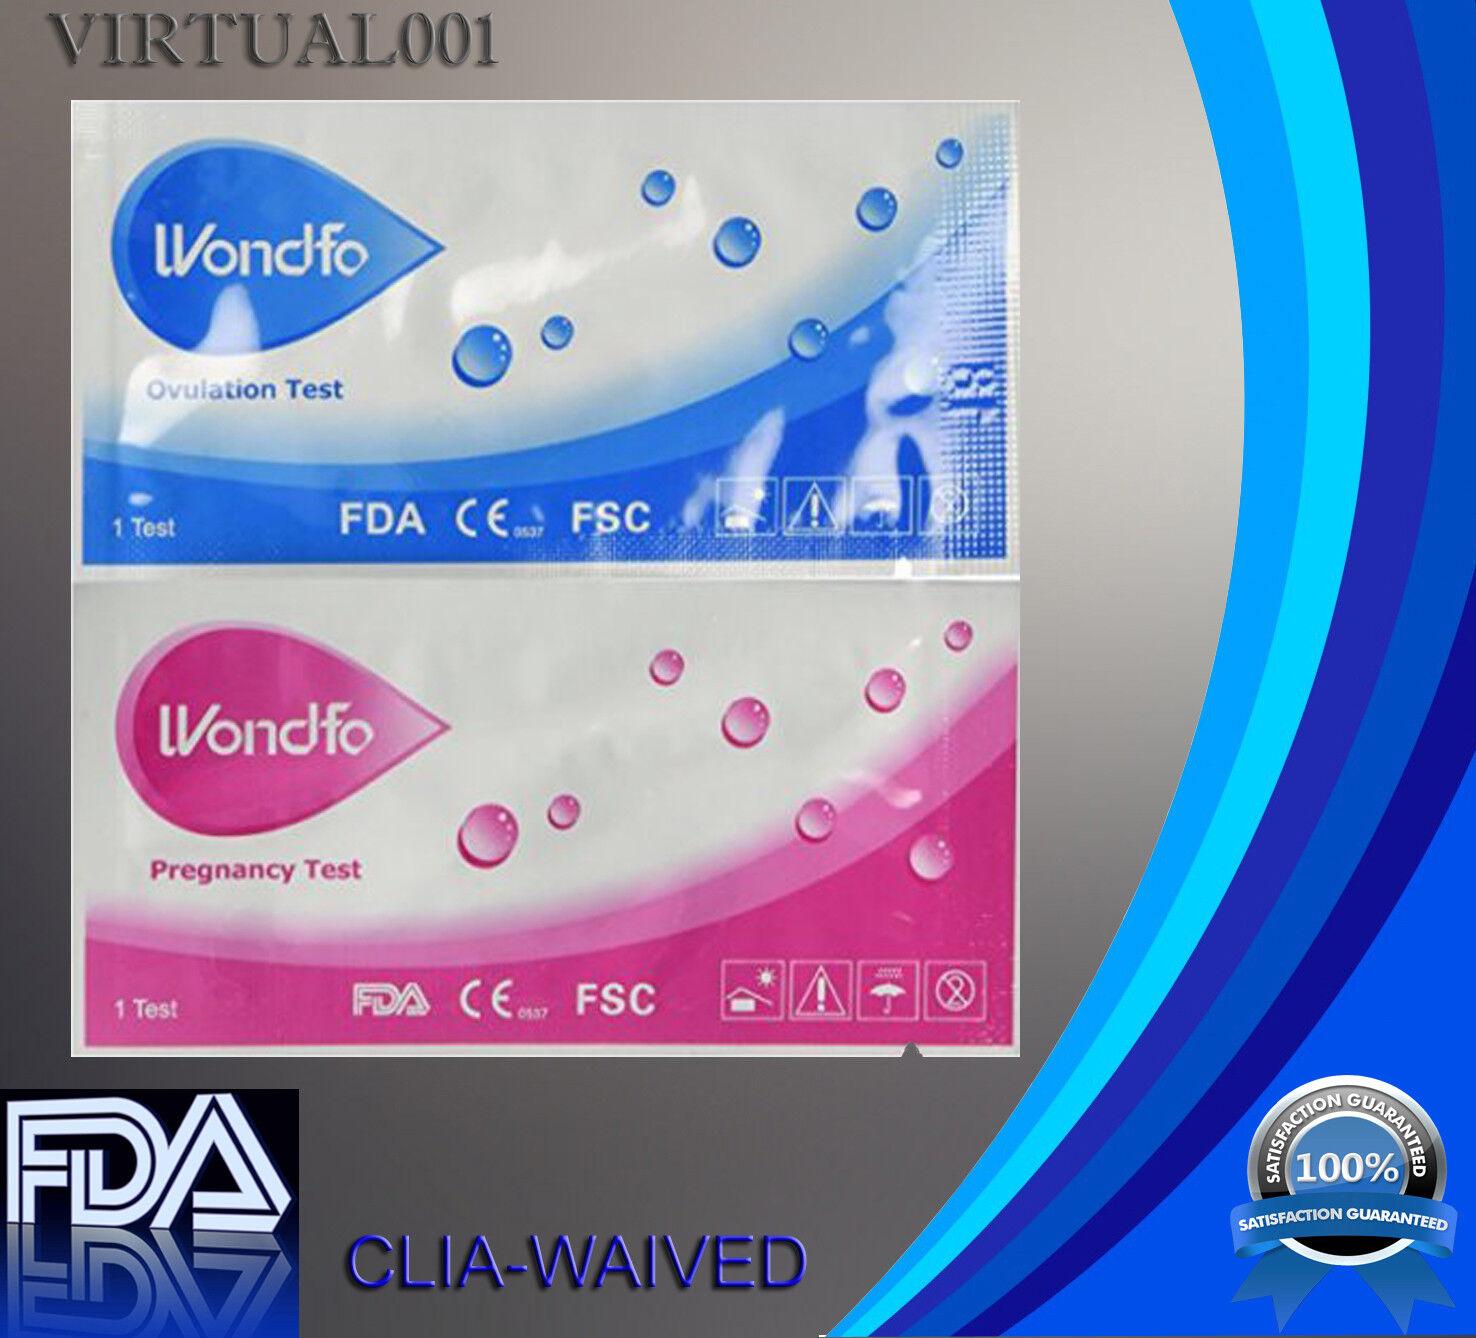 50 Wondfo Ovulation Test Strips and 20 Pregnancy Test Strips